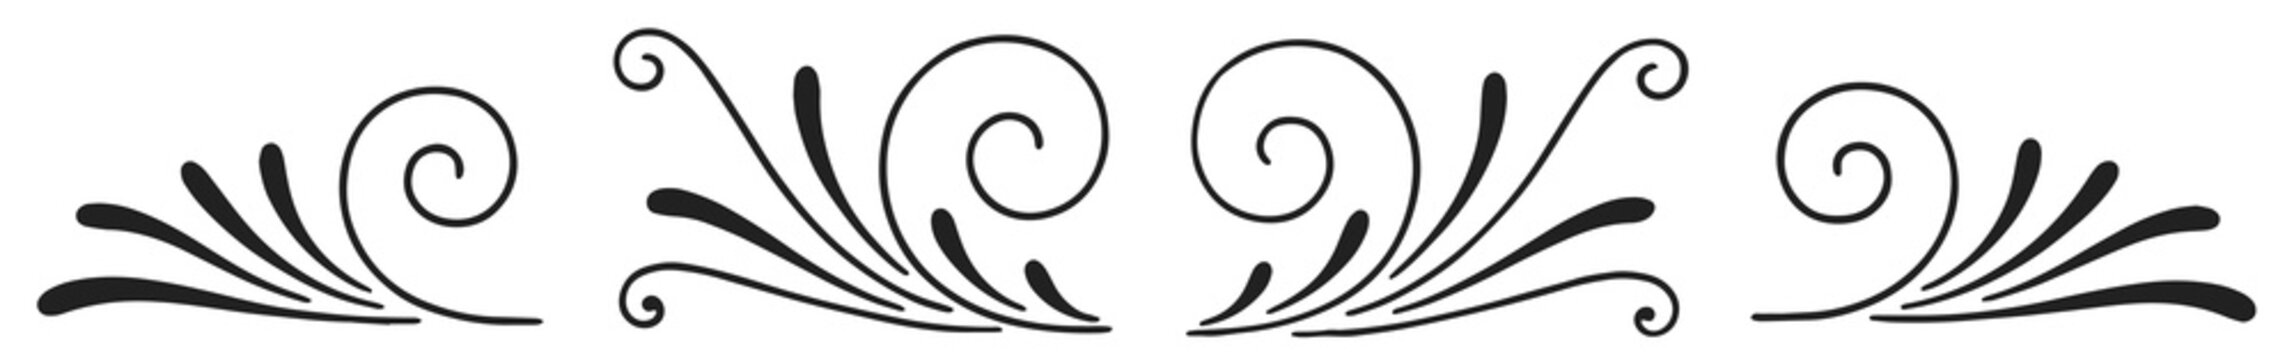 Vintage calligraphic decoration design elements set #isolated #vector